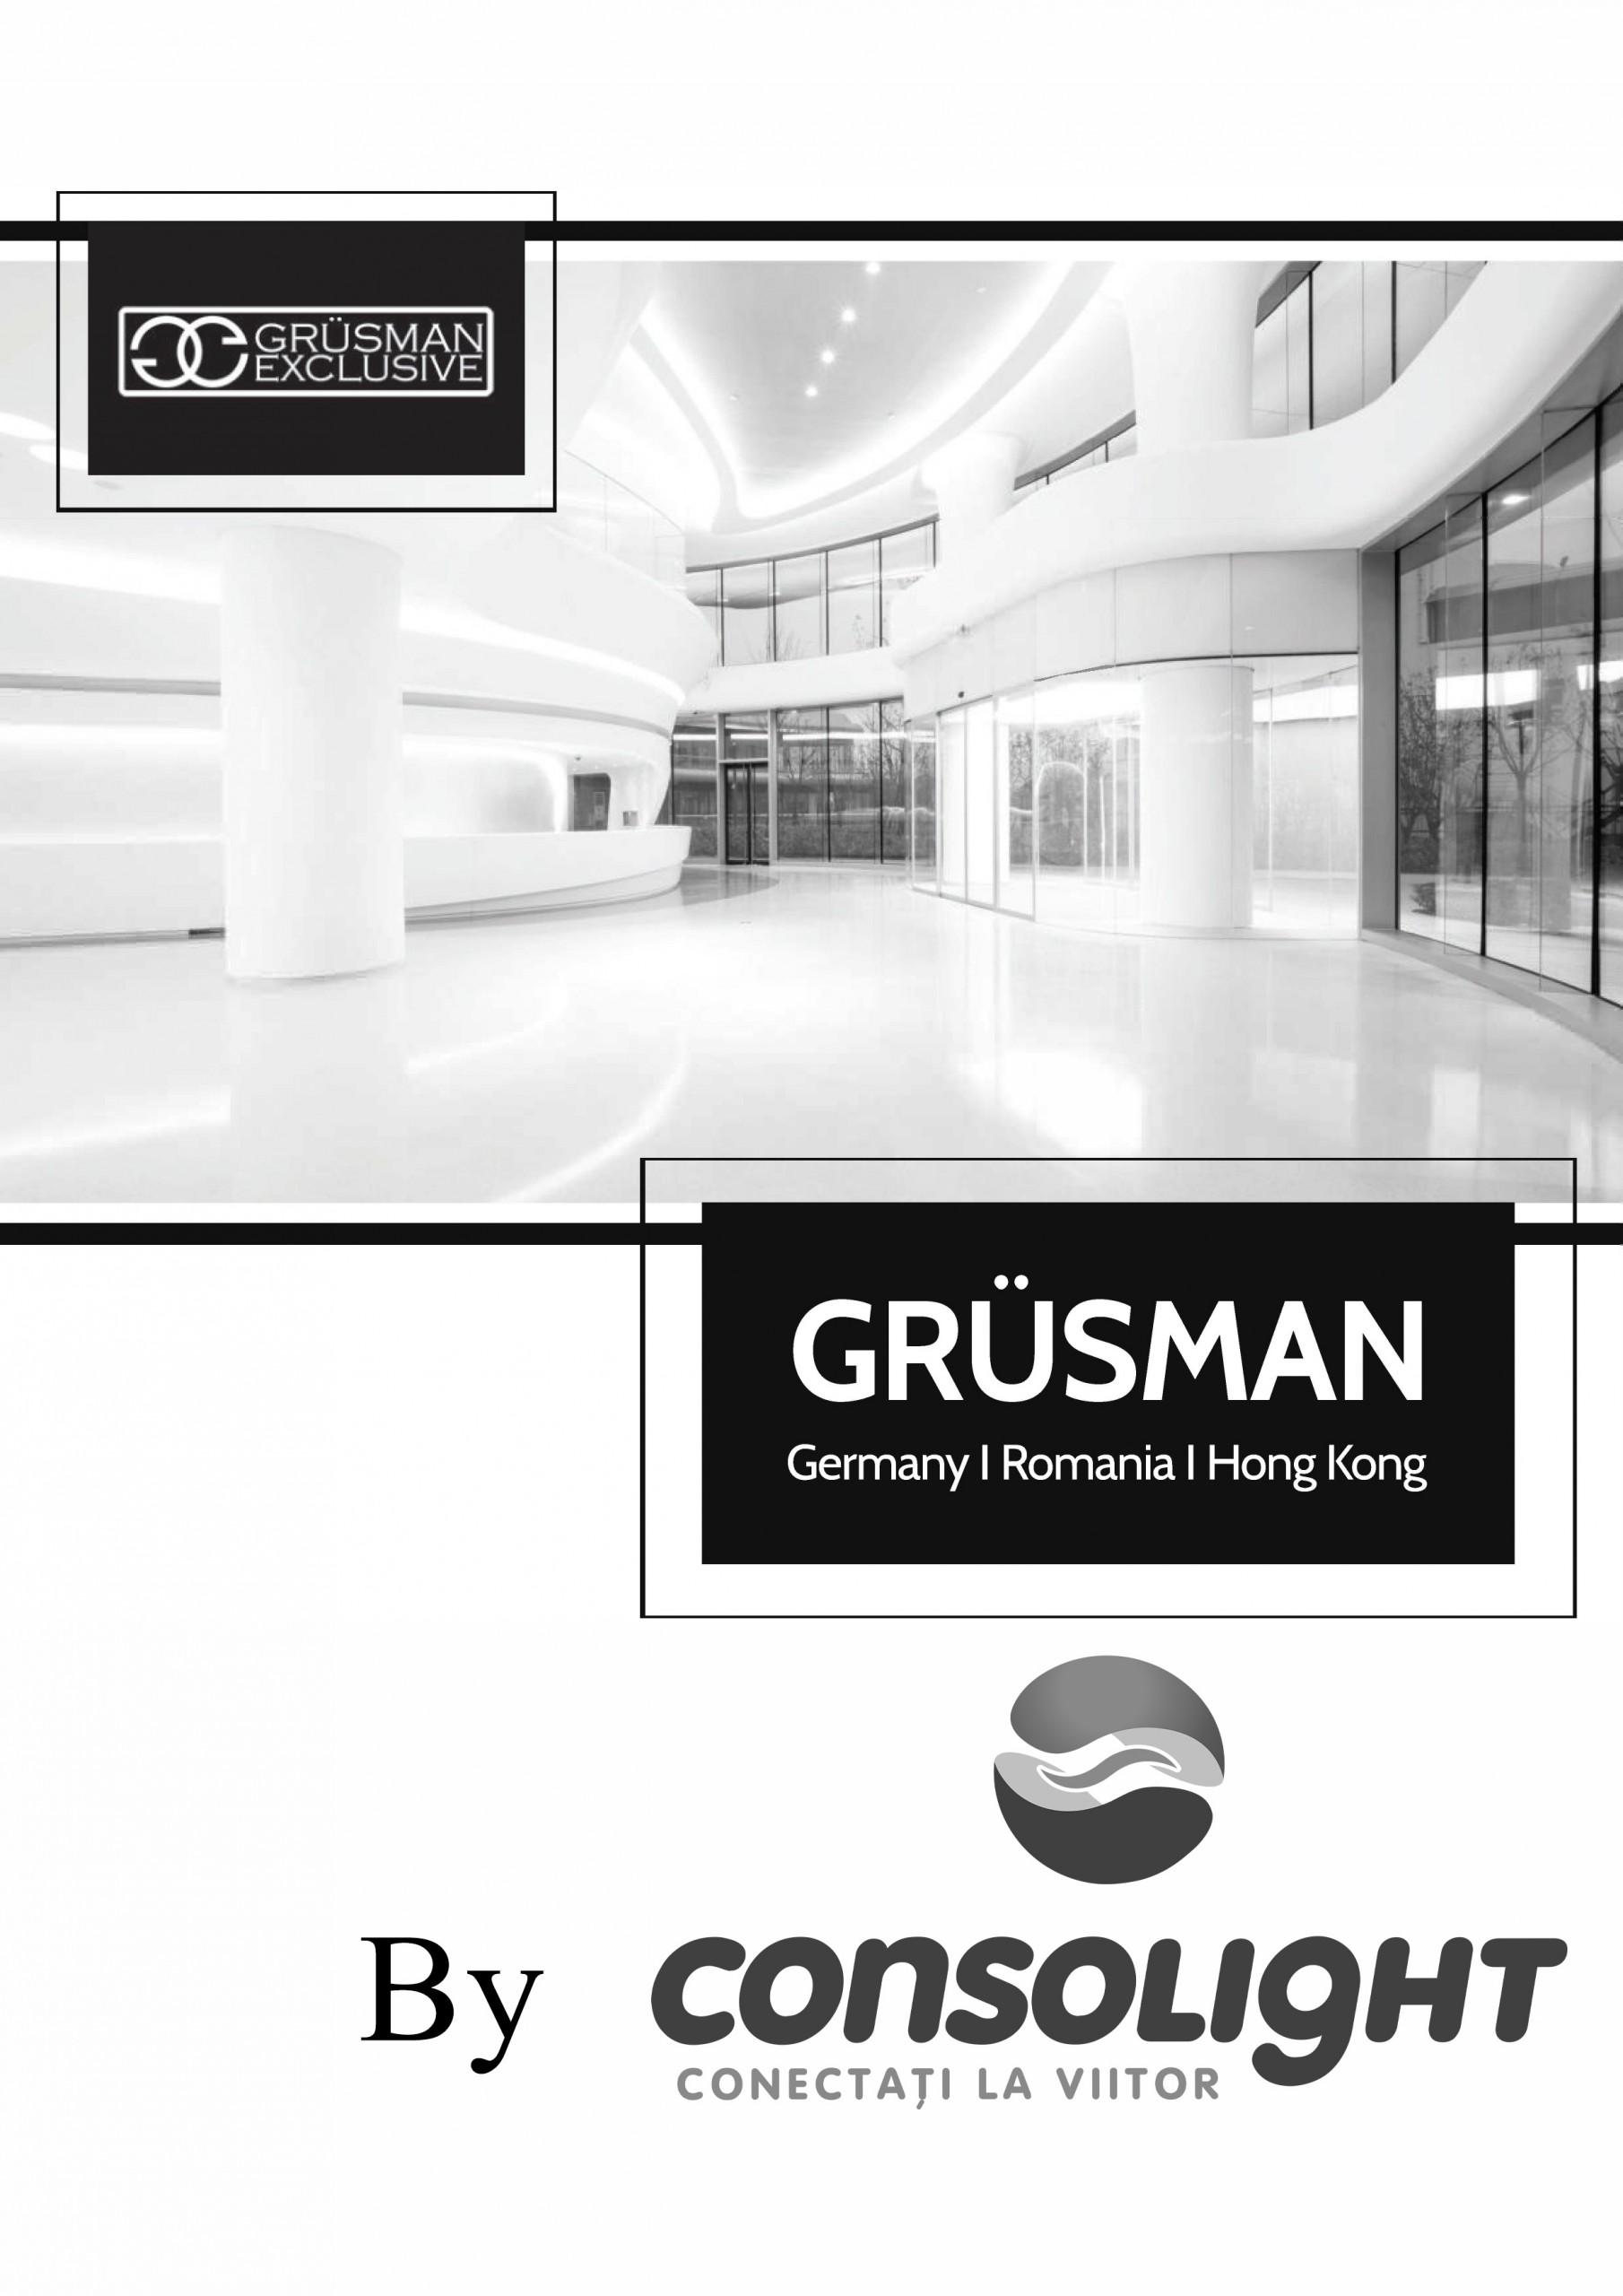 GRUSMAN